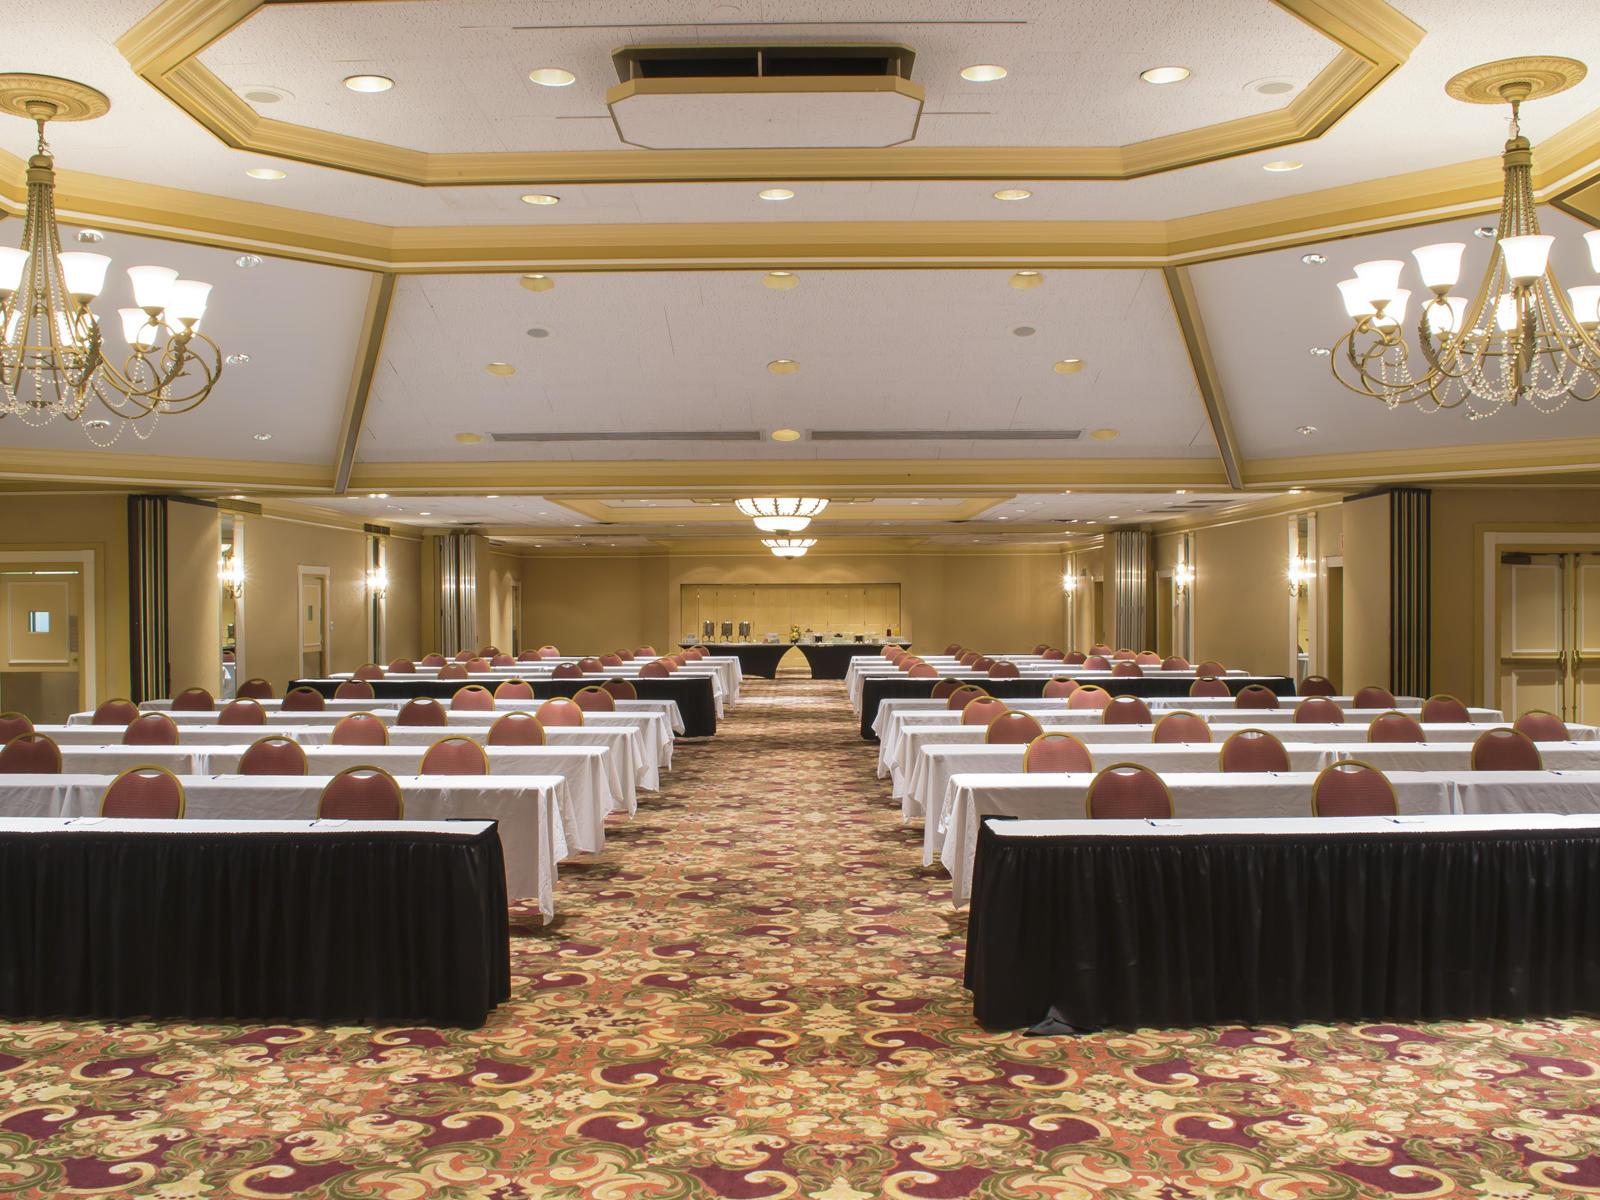 ballroom with seats